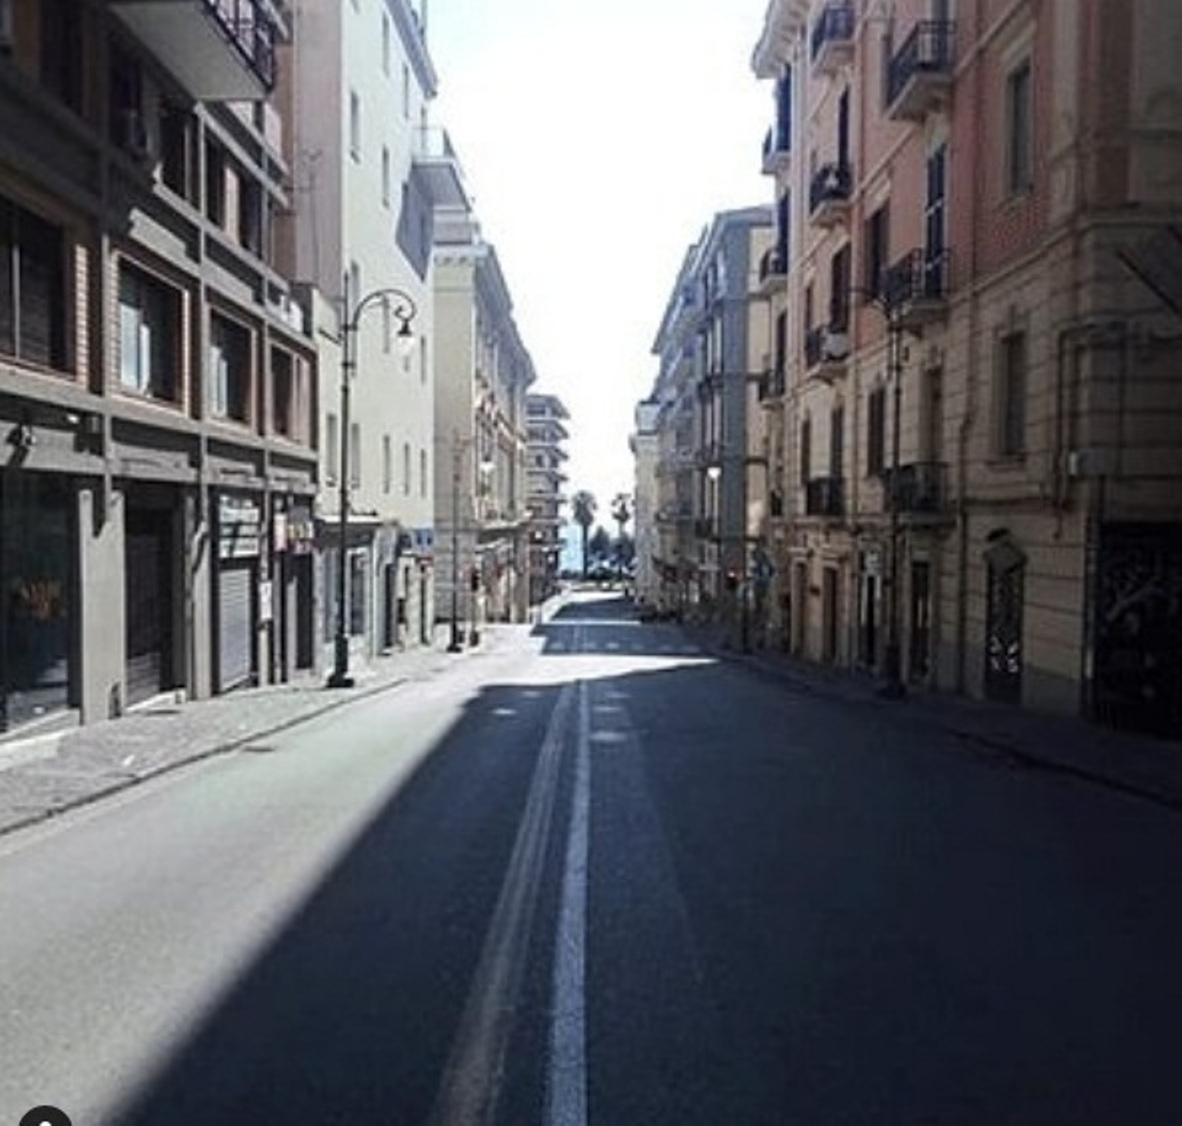 A deserted street in Salerno, Italy. Photo courtesy: Instagram/musicatv.girl